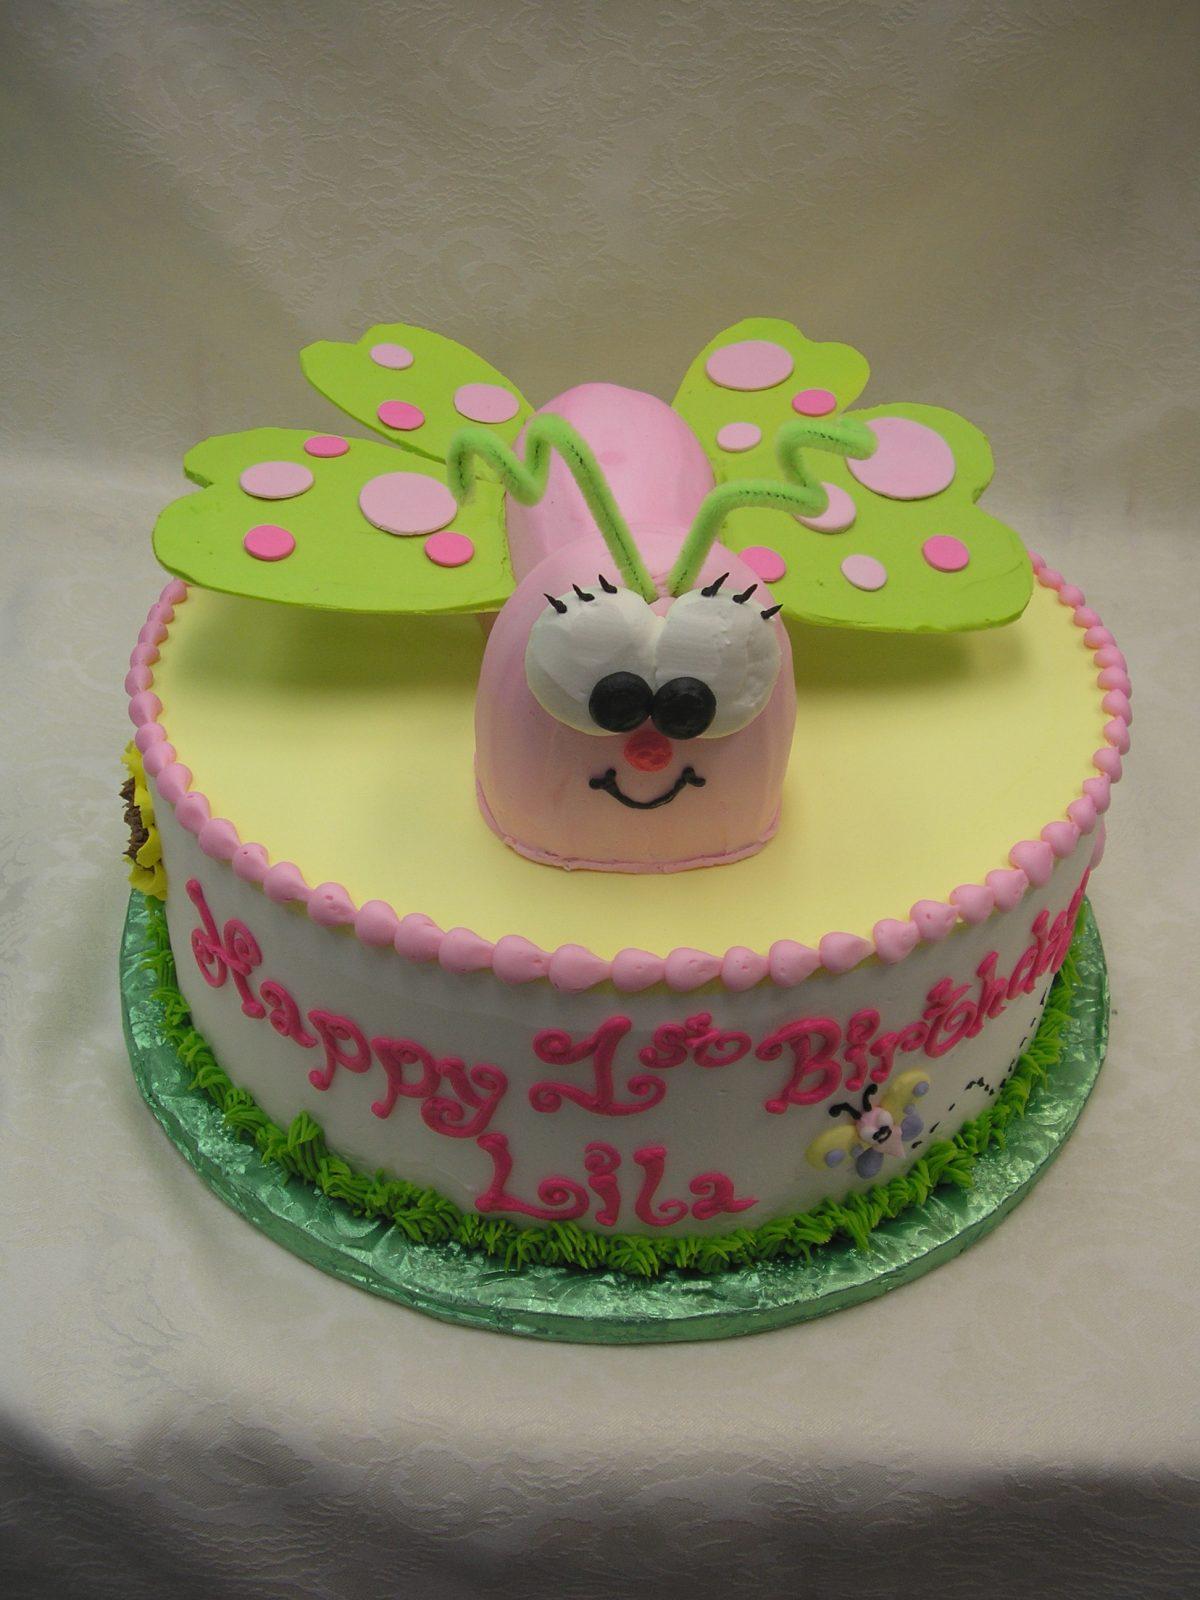 3D butterfly cake